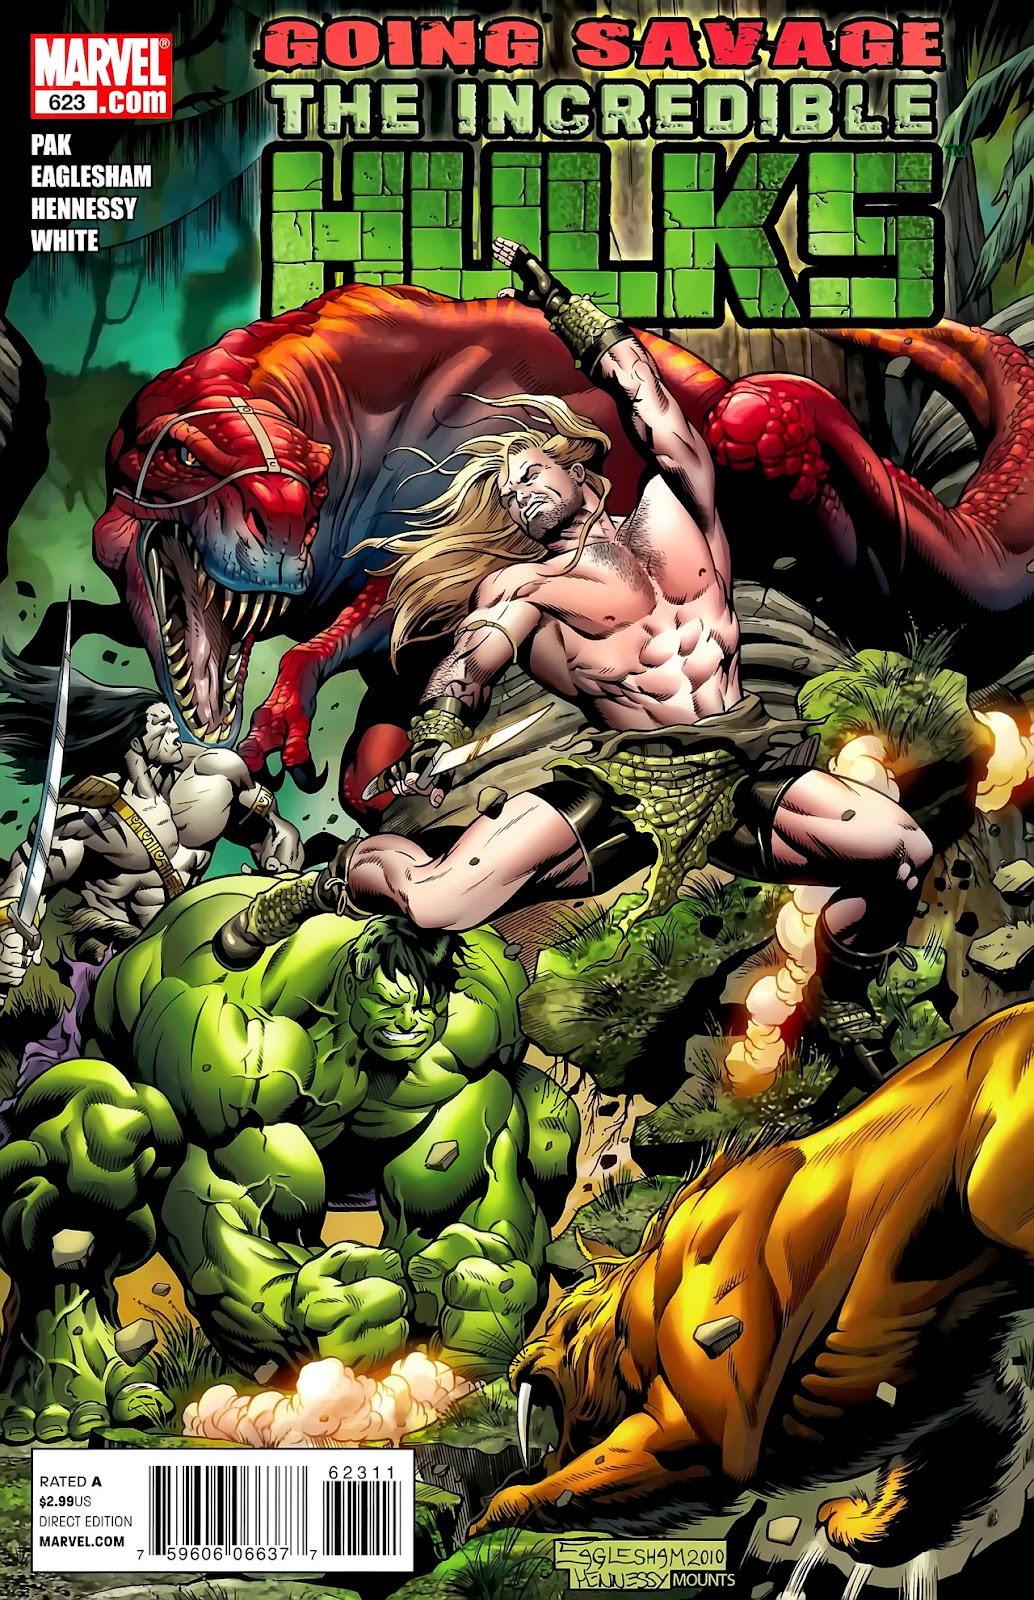 Incredible Hulks (2010) Issue #623 #13 - English 1